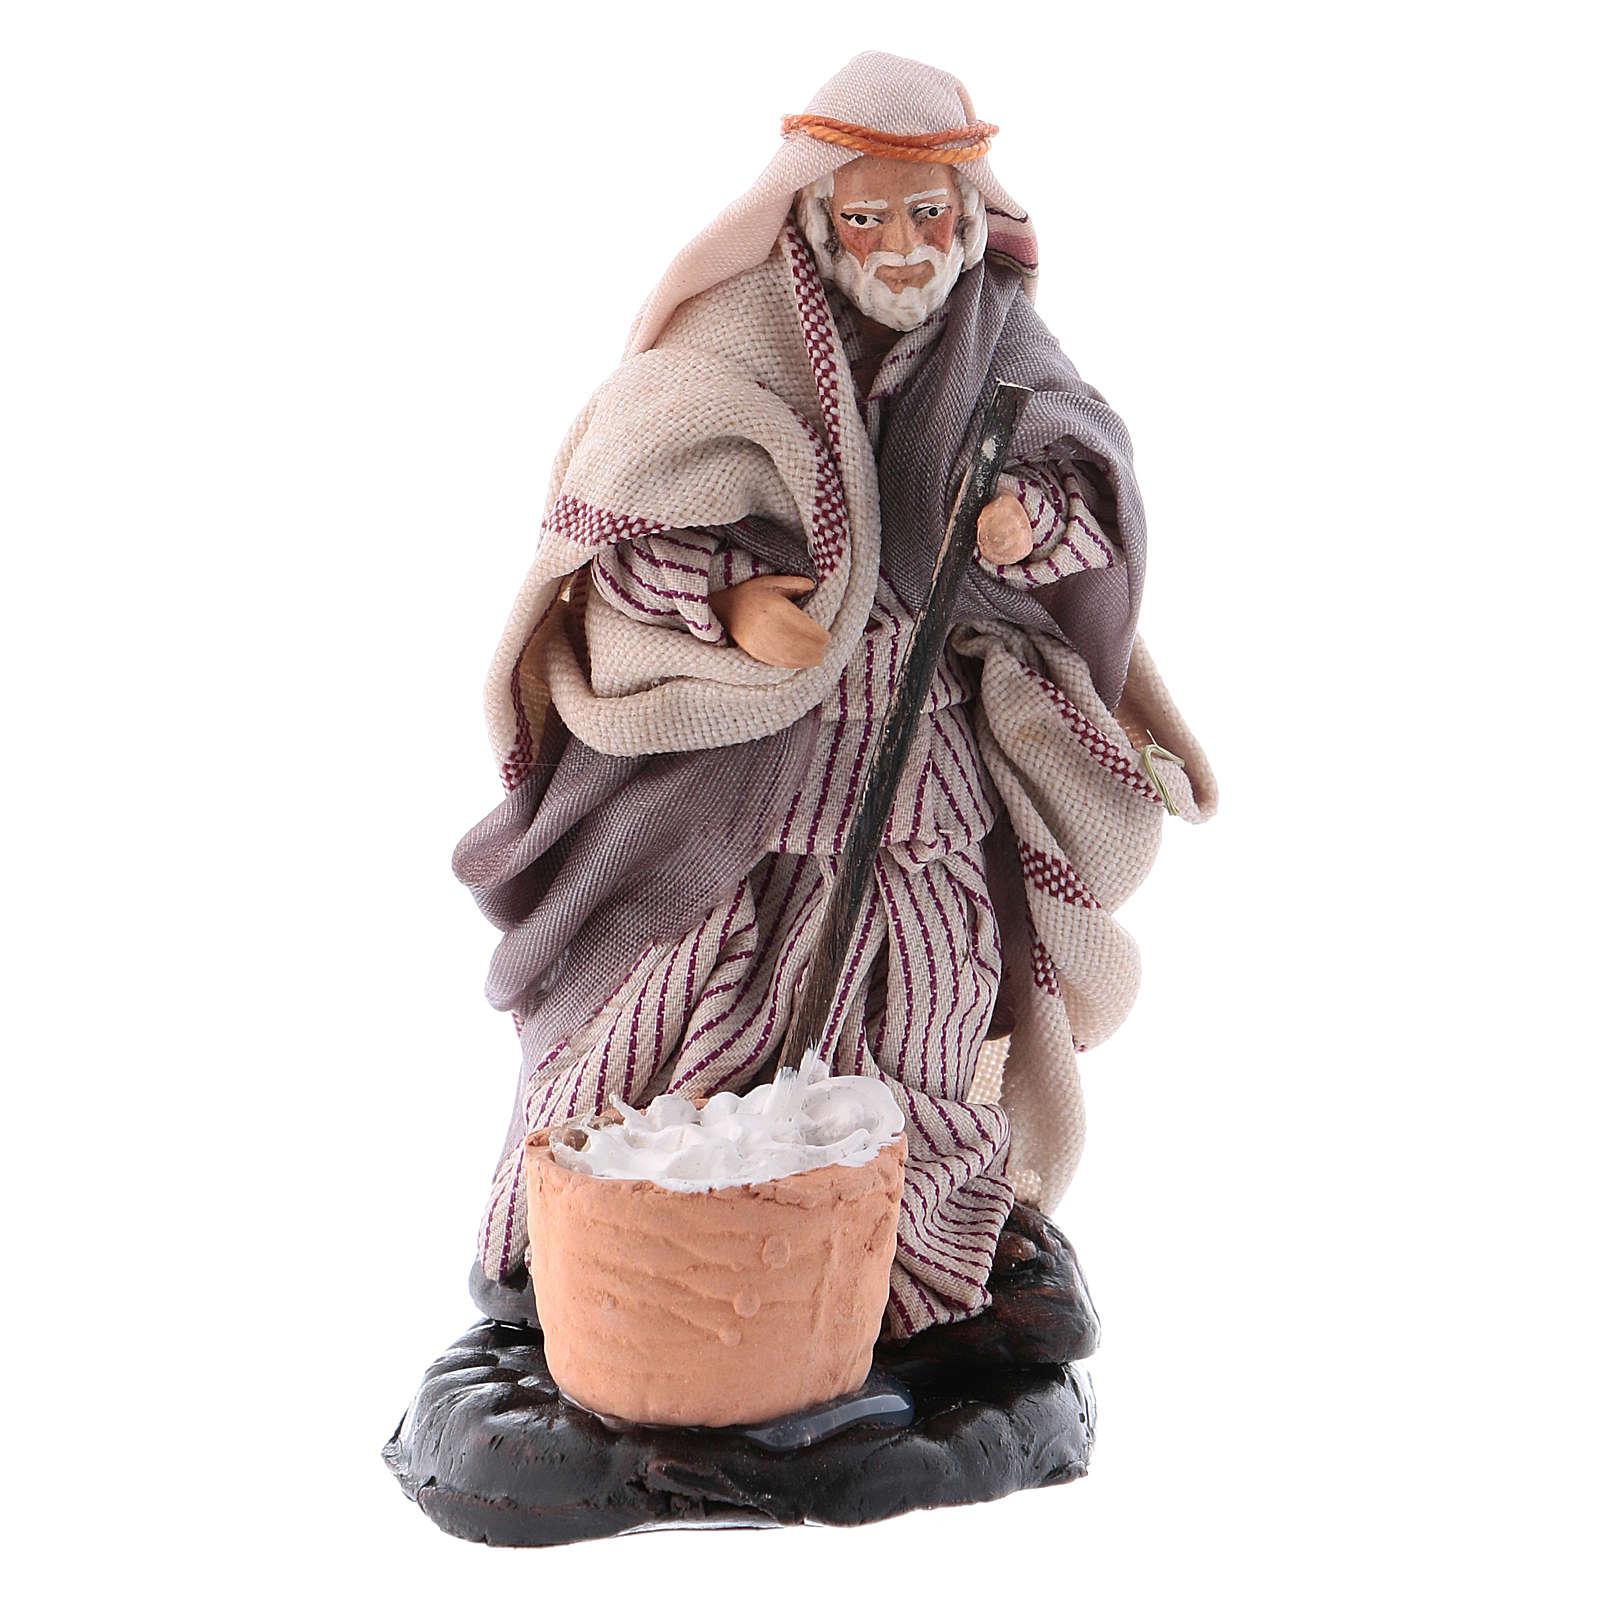 Neapolitan nativity figurine, cheese maker 8cm 4